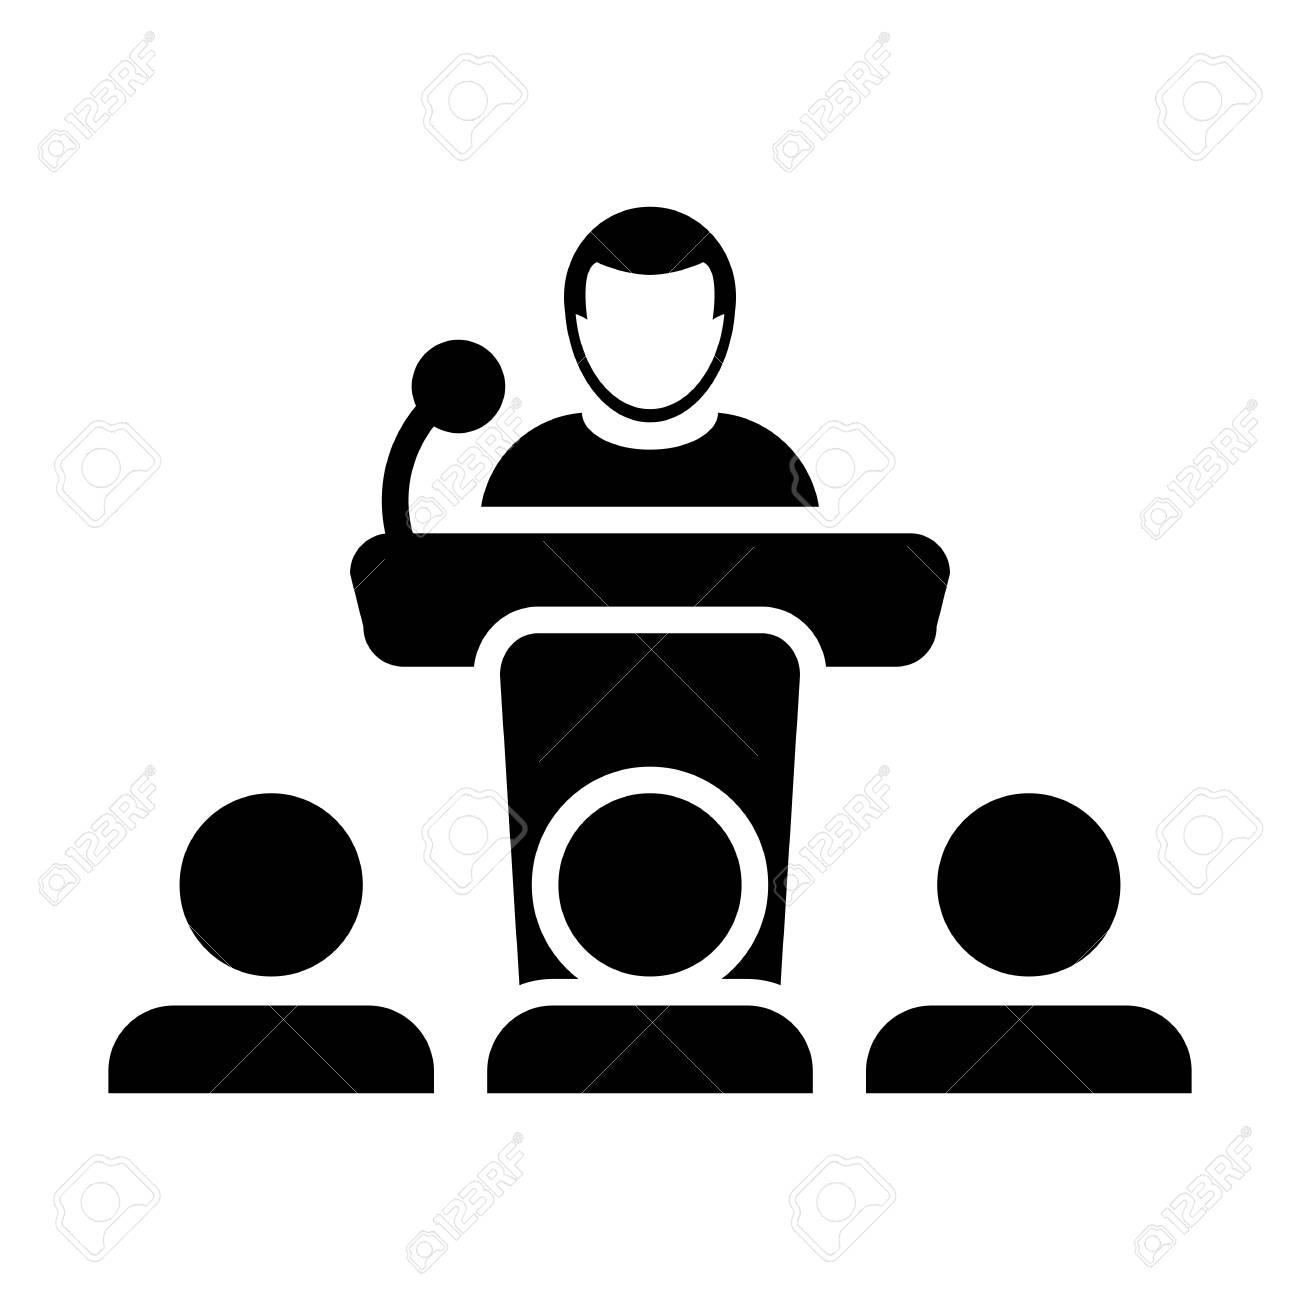 public speaking icon vector male person on podium for presentation rh 123rf com public speaking clipart images public speaking animated clipart